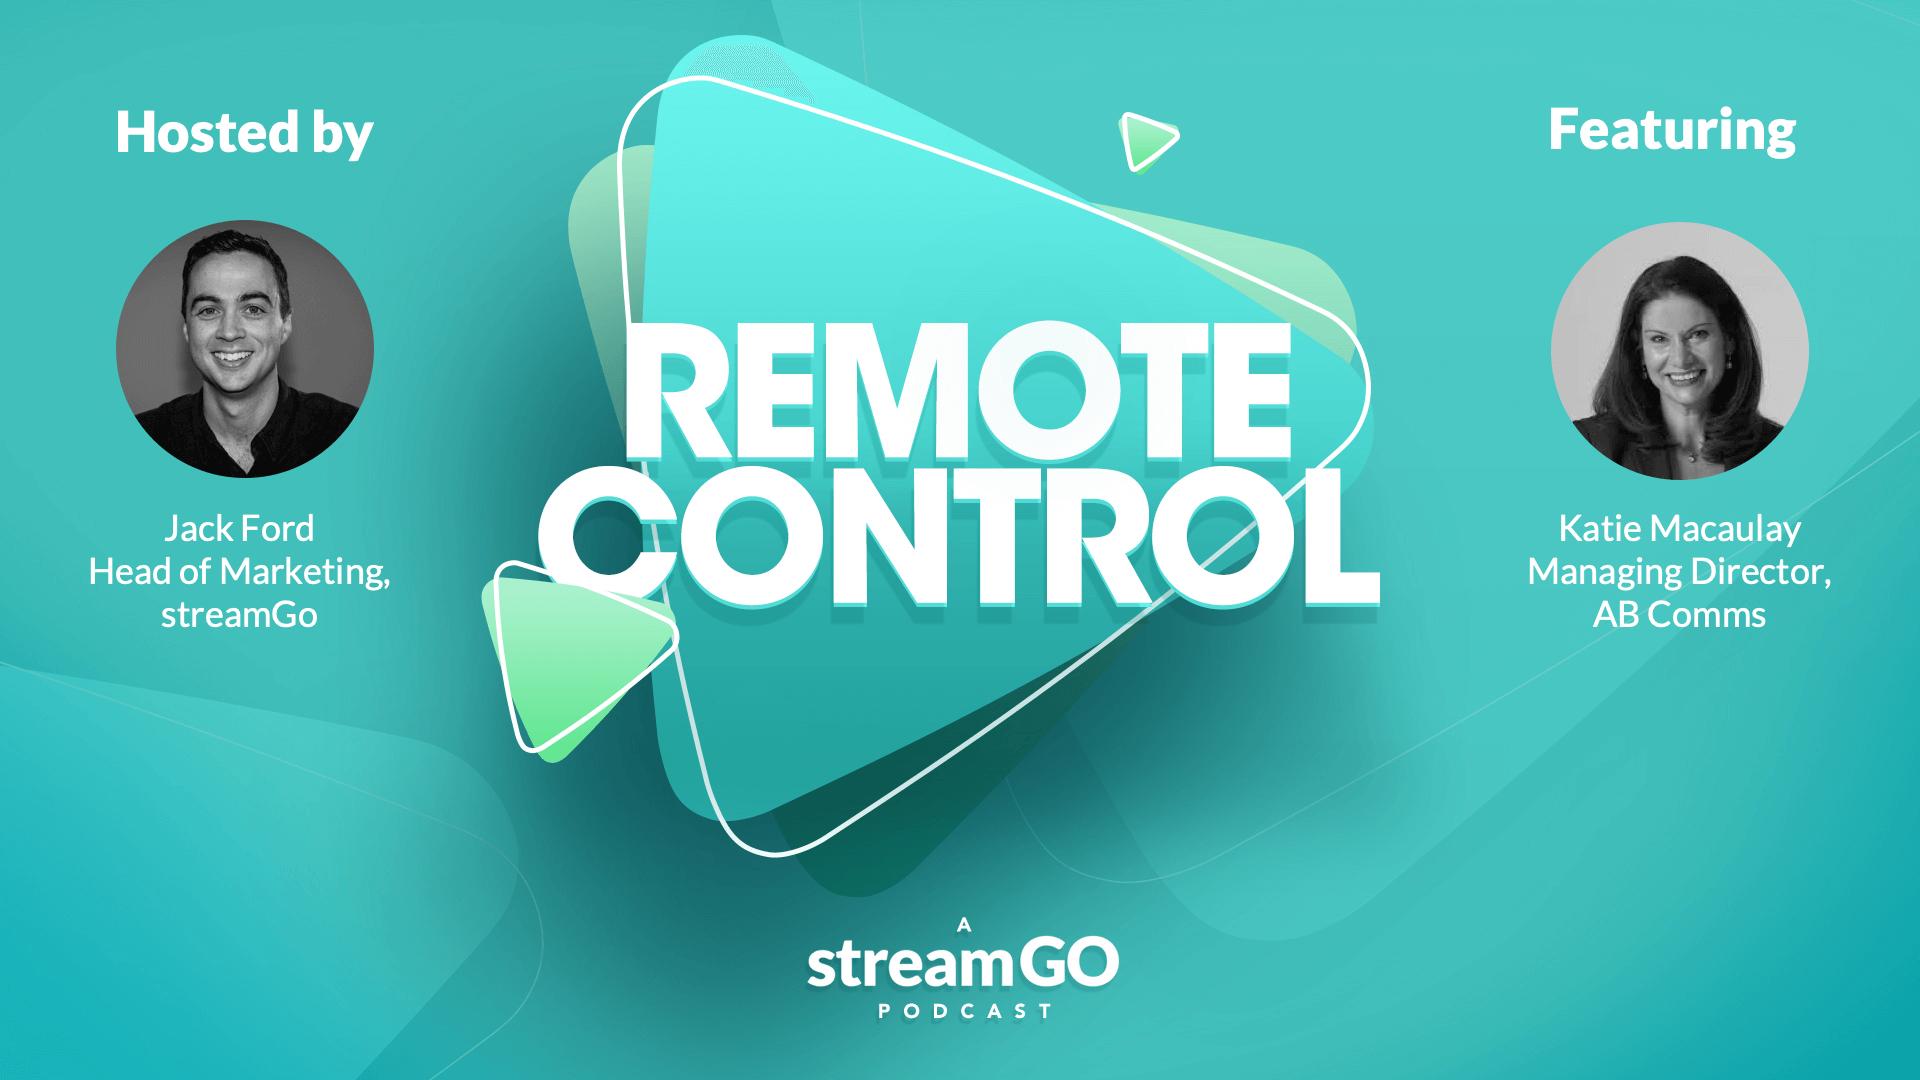 Remote Control - Katie Macaulay